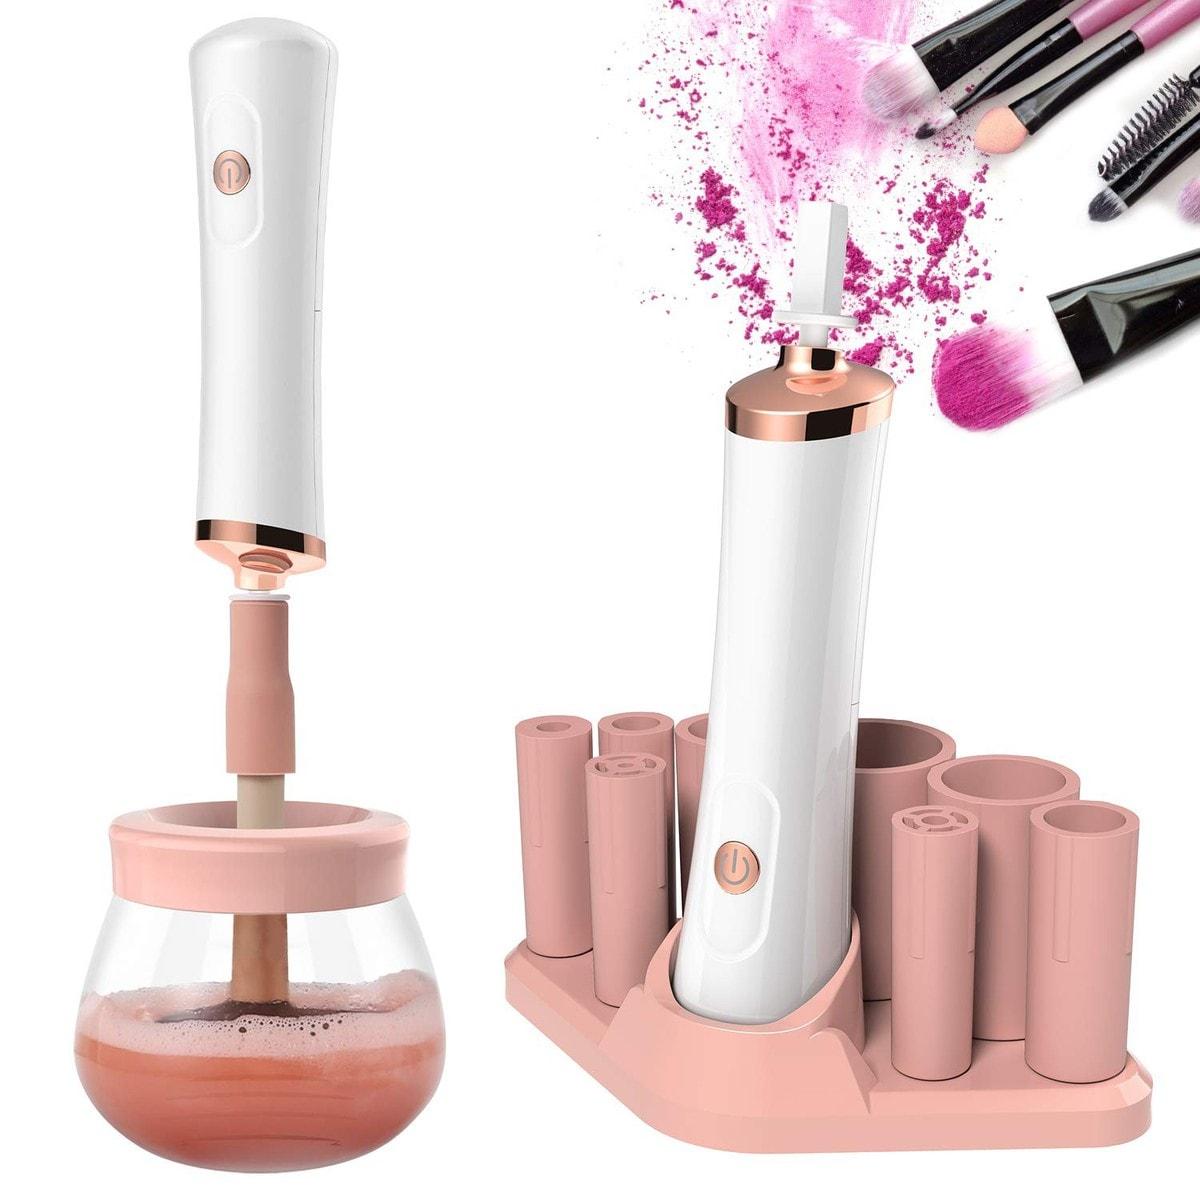 Senbowe Upgraded Makeup Brush Cleaner